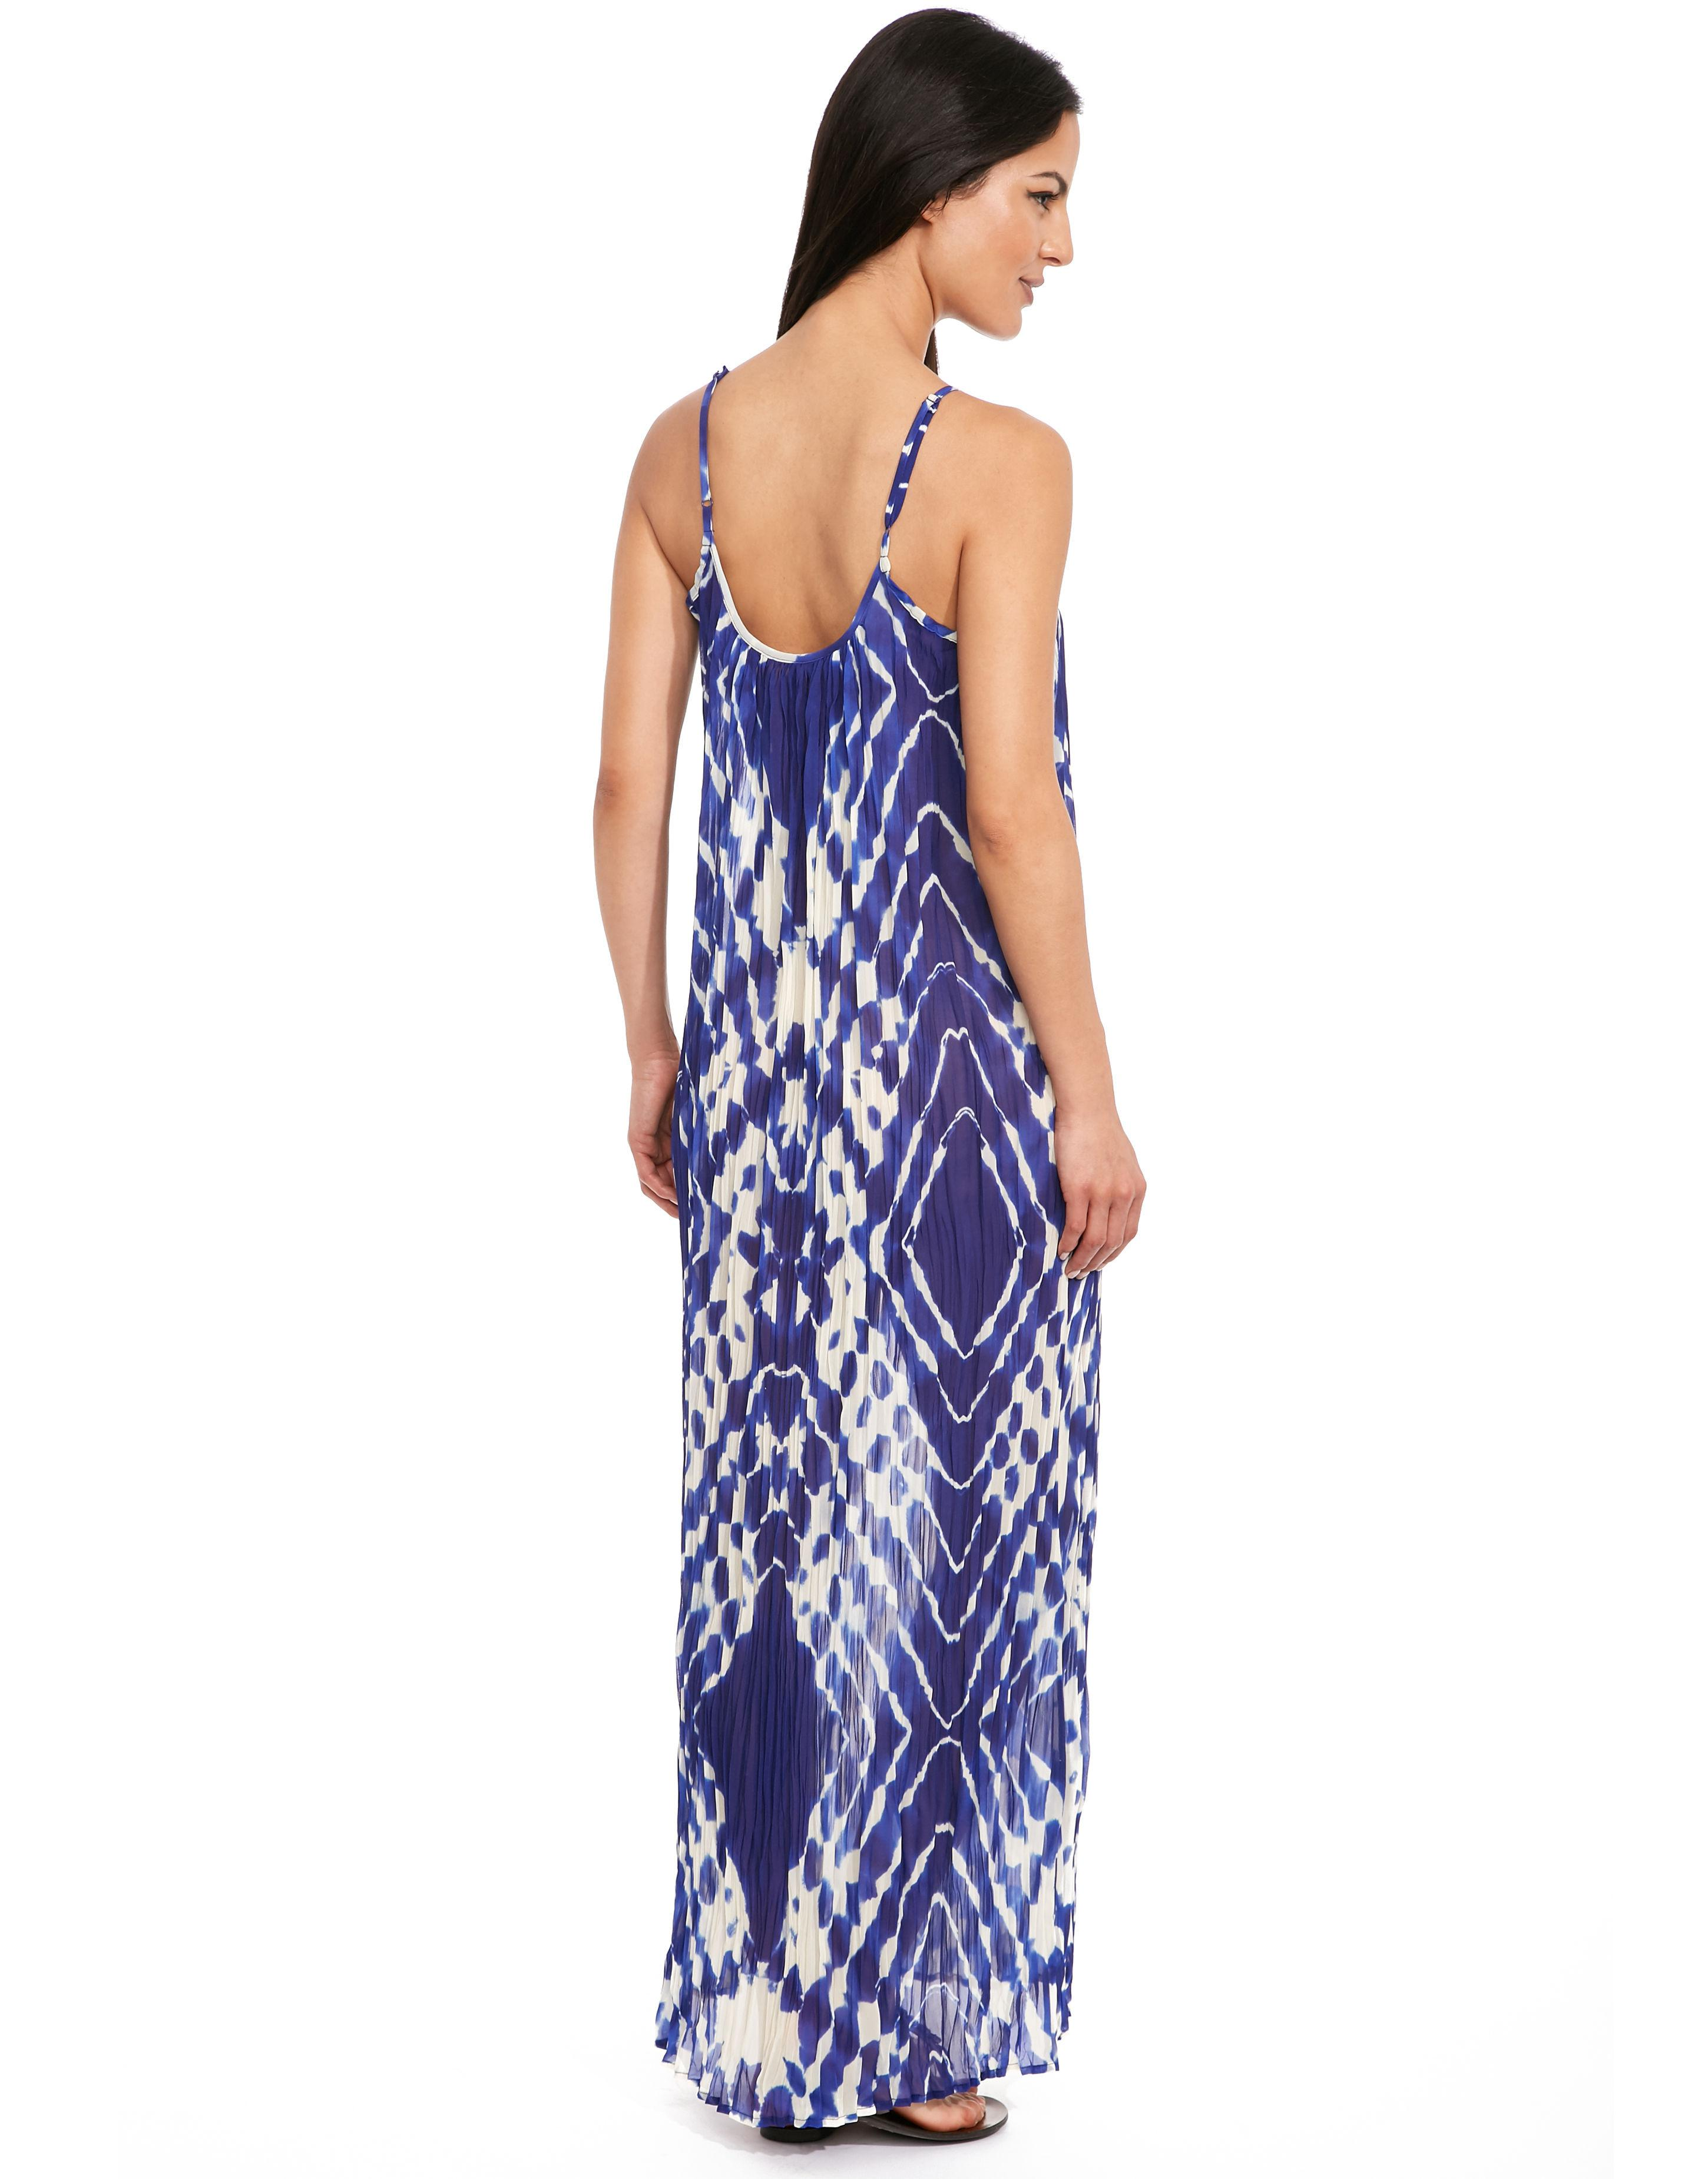 8ef8fda82d Figleaves Kaya Beach Maxi Dress in Purple - Lyst